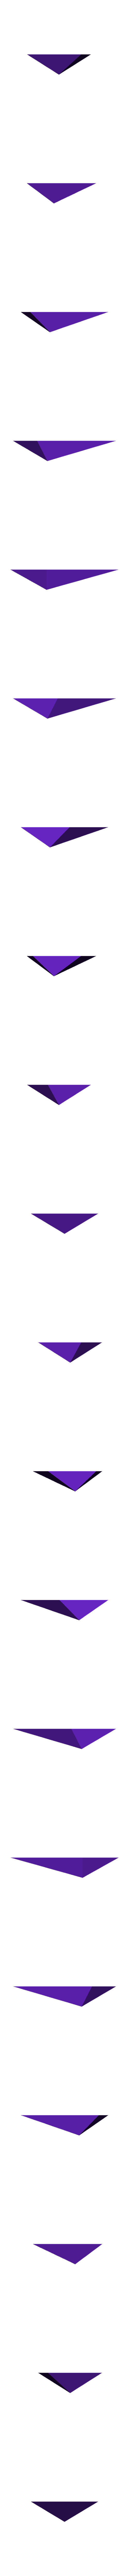 shield_diamond.stl Download free STL file Spear head • 3D printer model, Balkhgar